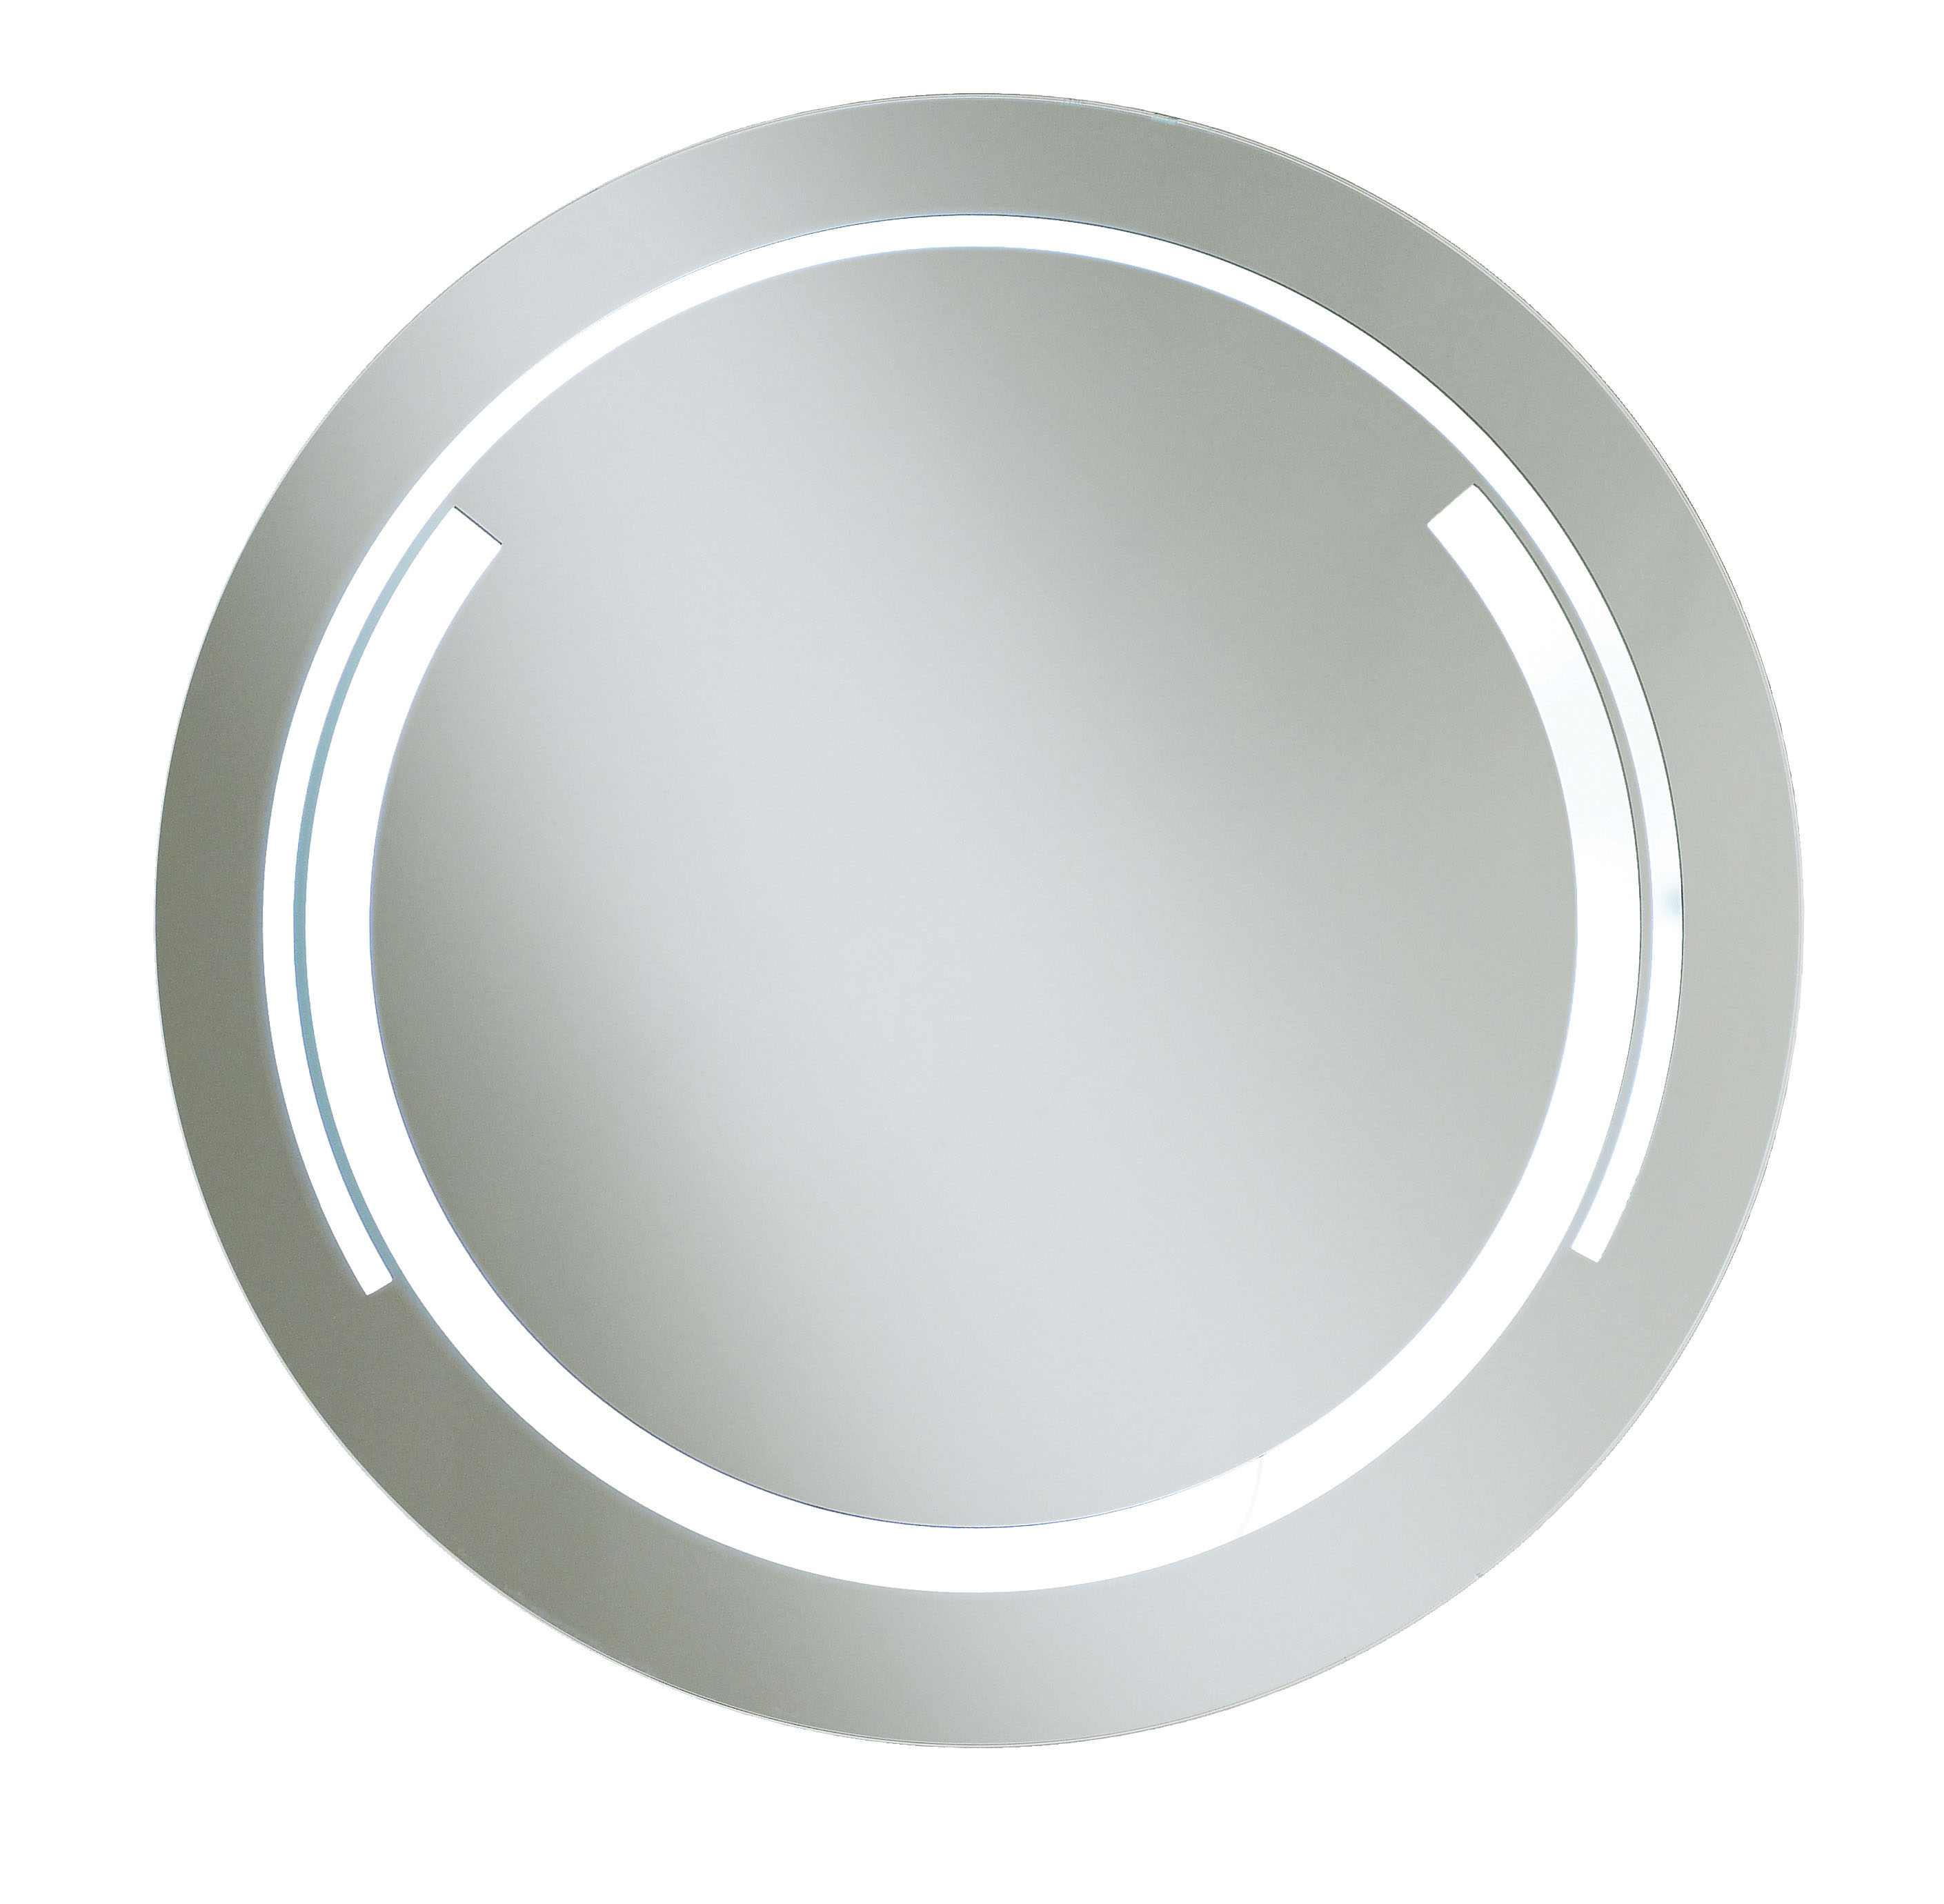 The Saturn Illuminated Mirror Is 600mm In Diameter